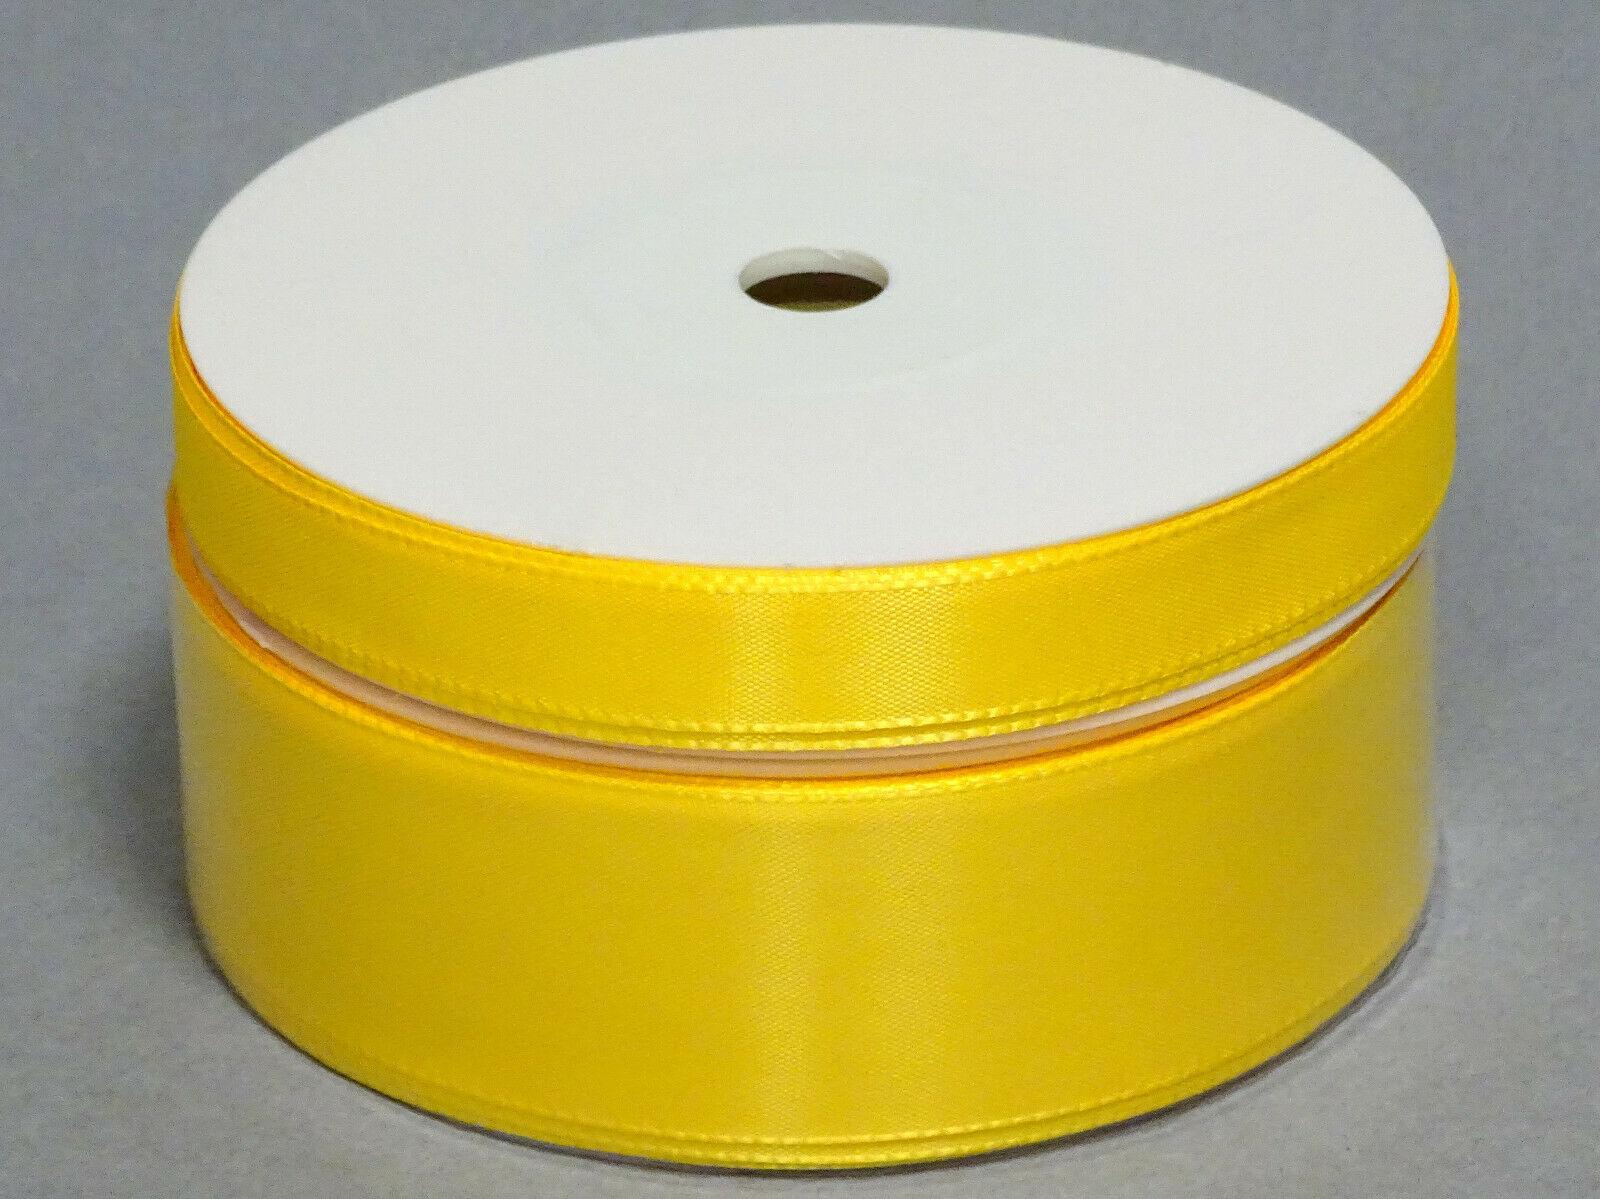 Seidenband Schleifenband 50 m x 15 mm / 40 mm Dekoband ab 0,08 €/m Geschenkband  - Gelb 245, 15 mm x 50 m